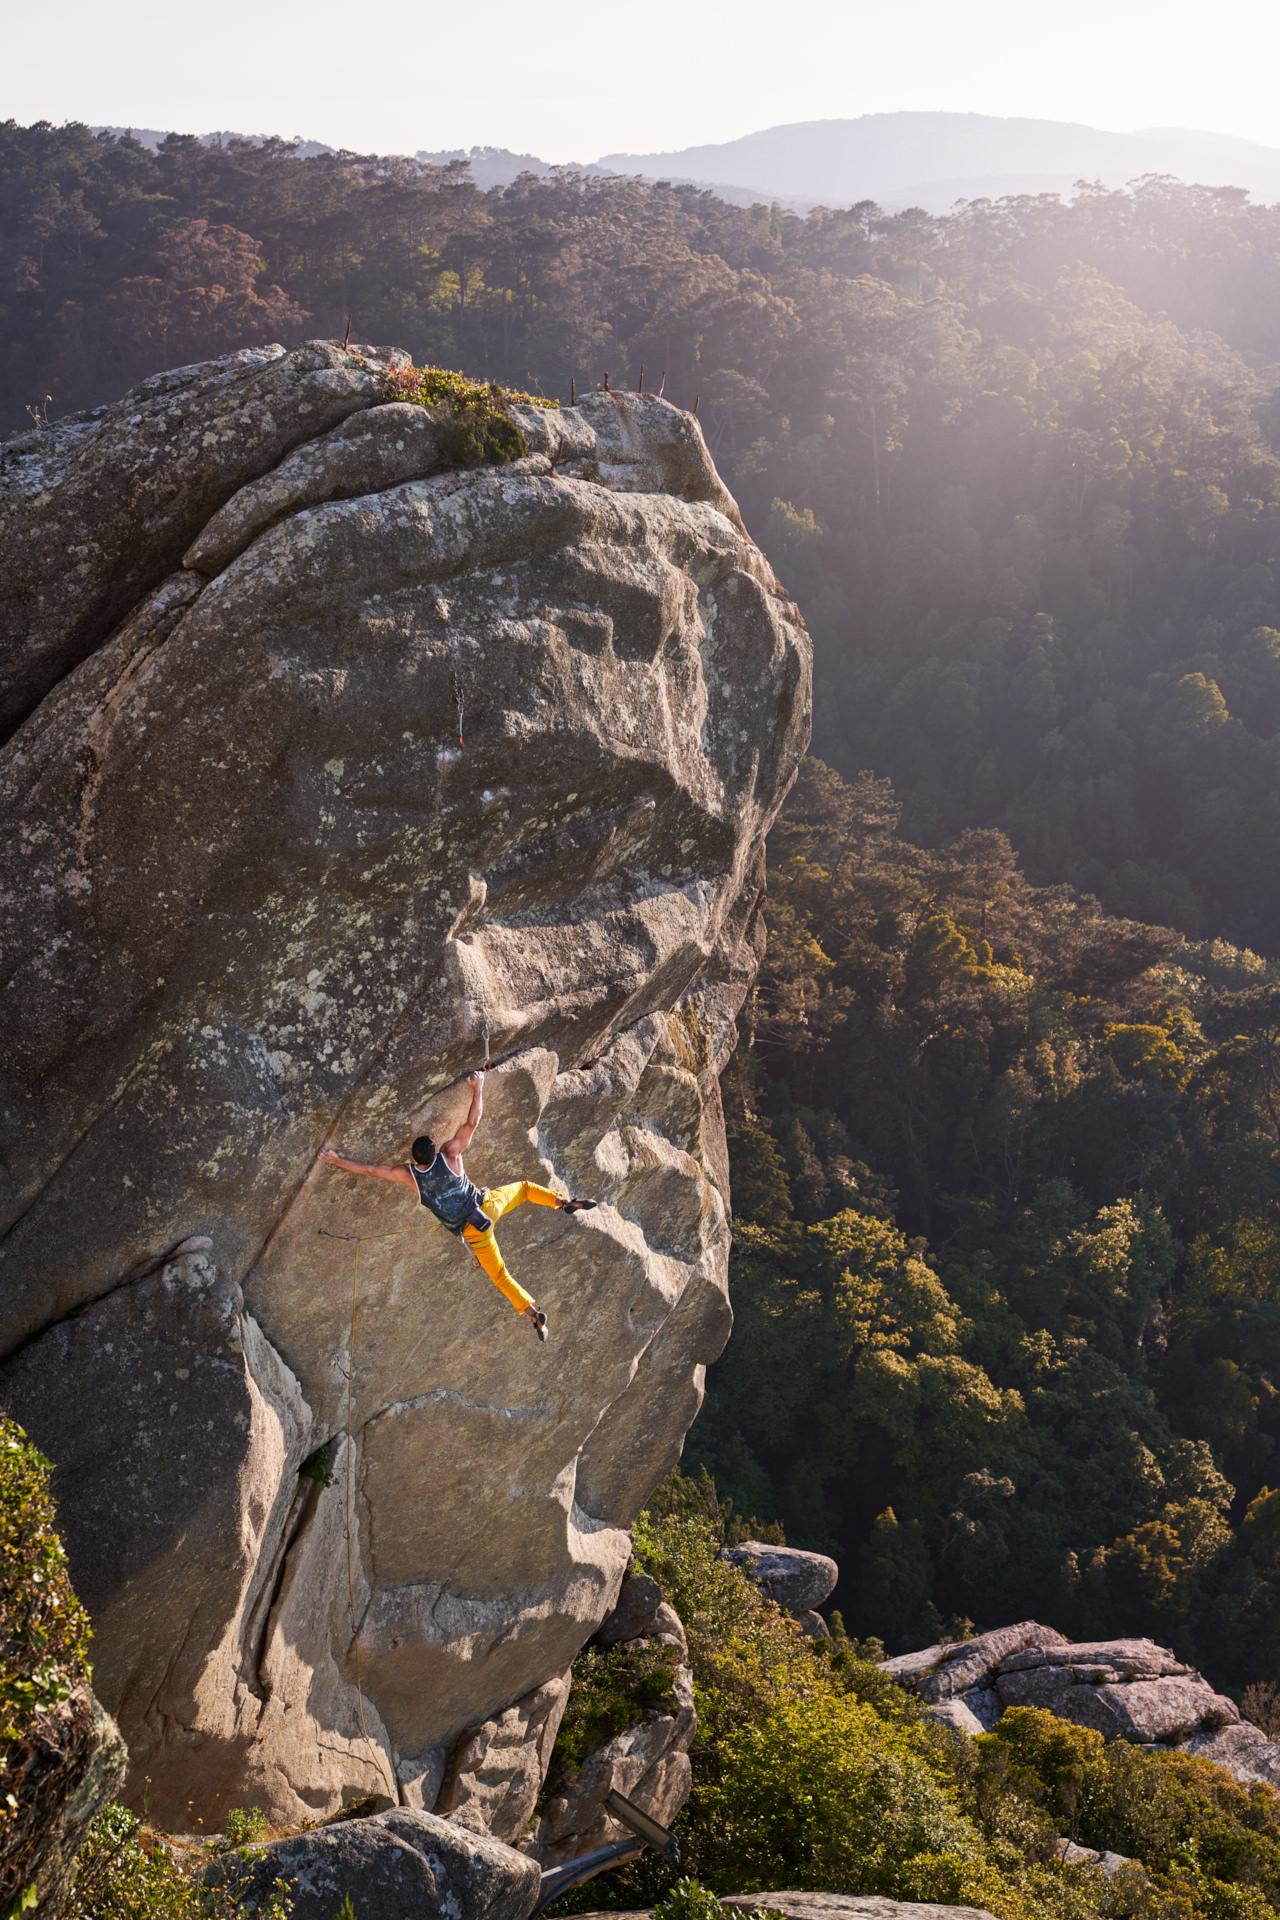 Lisbon Climbing Guide - Pedro Alves climbing Deus do Vento (7a) in Penedo da Amizade (Sintra) ©Martim Vidigal